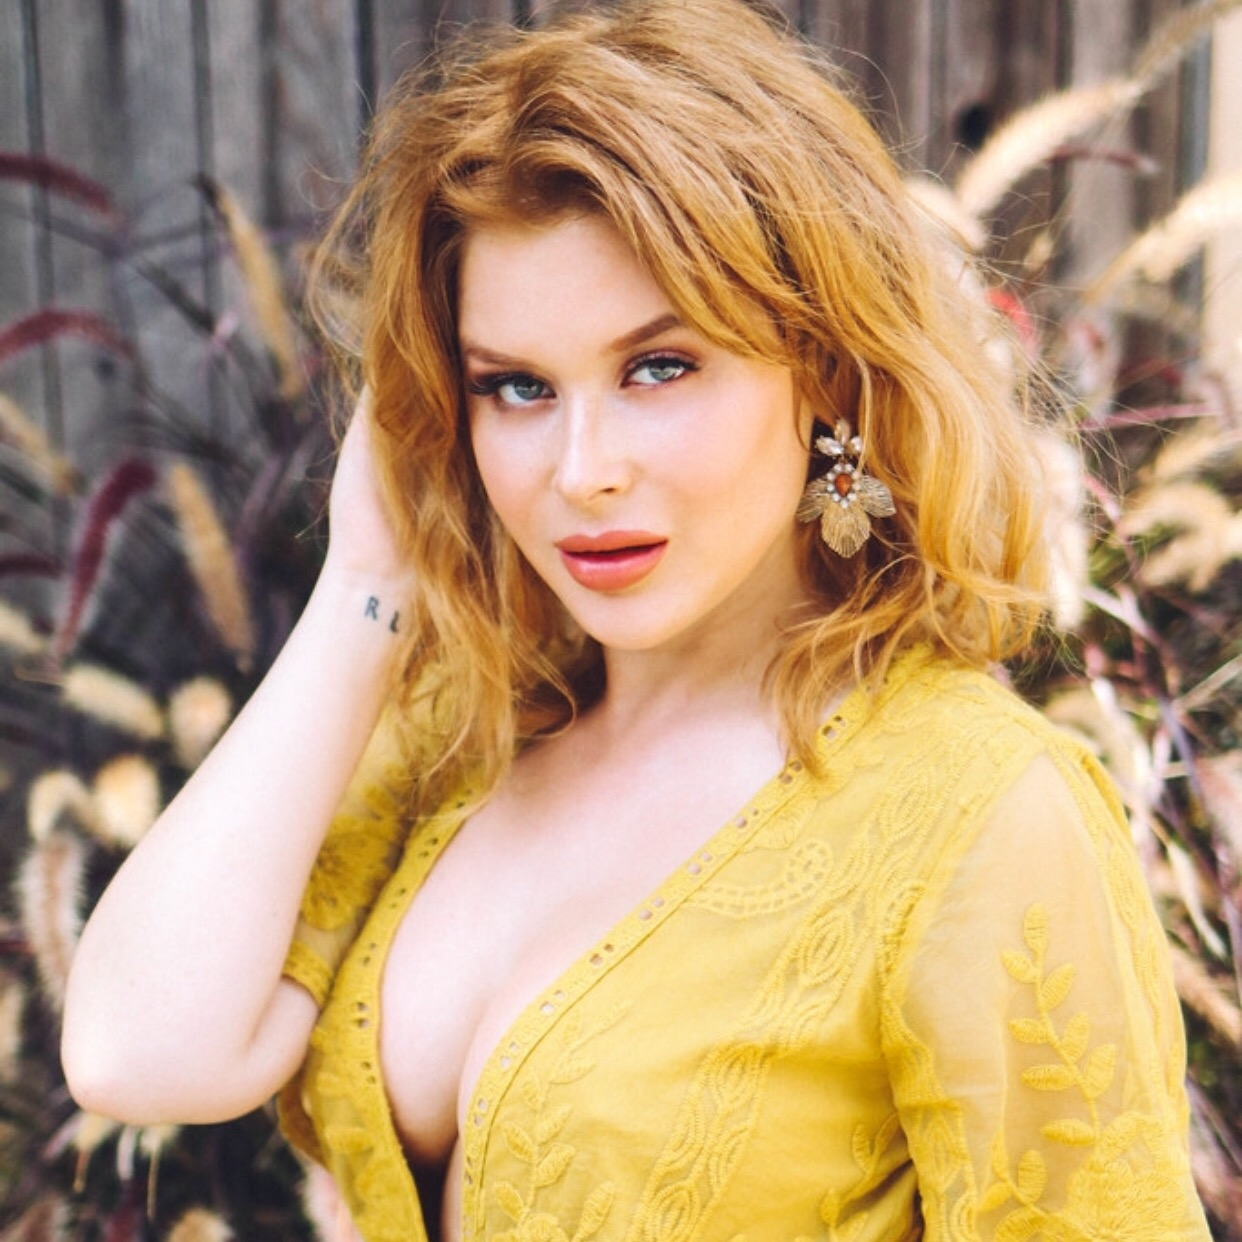 Pics Renee Olstead nude photos 2019